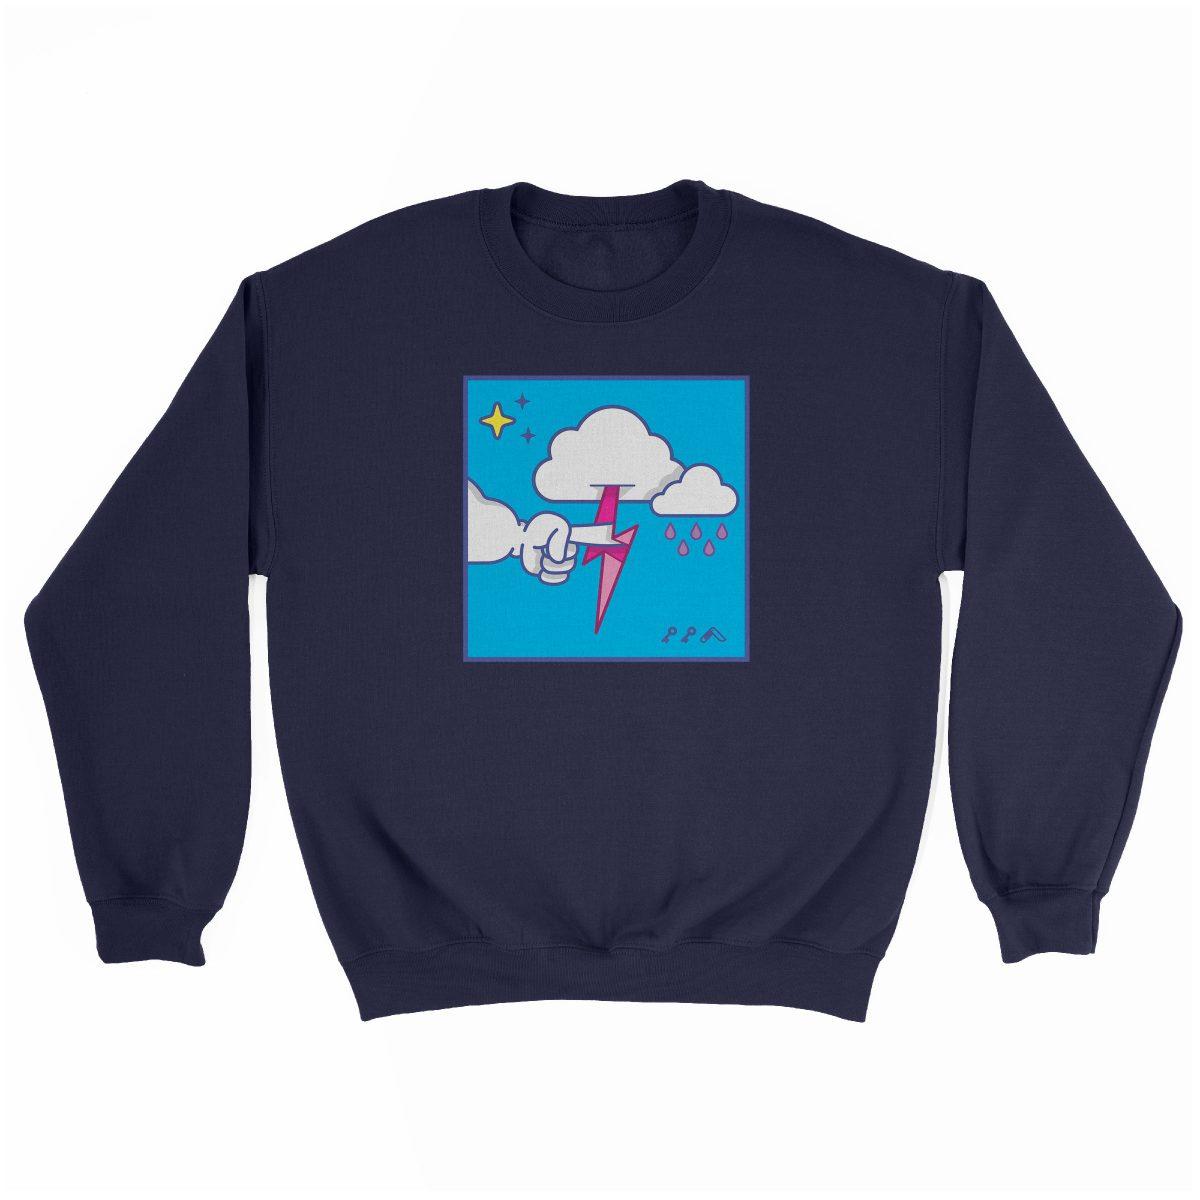 """MUTUAL CLOUDSENT"" funny adult cartoon animation style sweatshirt in navy at kikicutt.com"